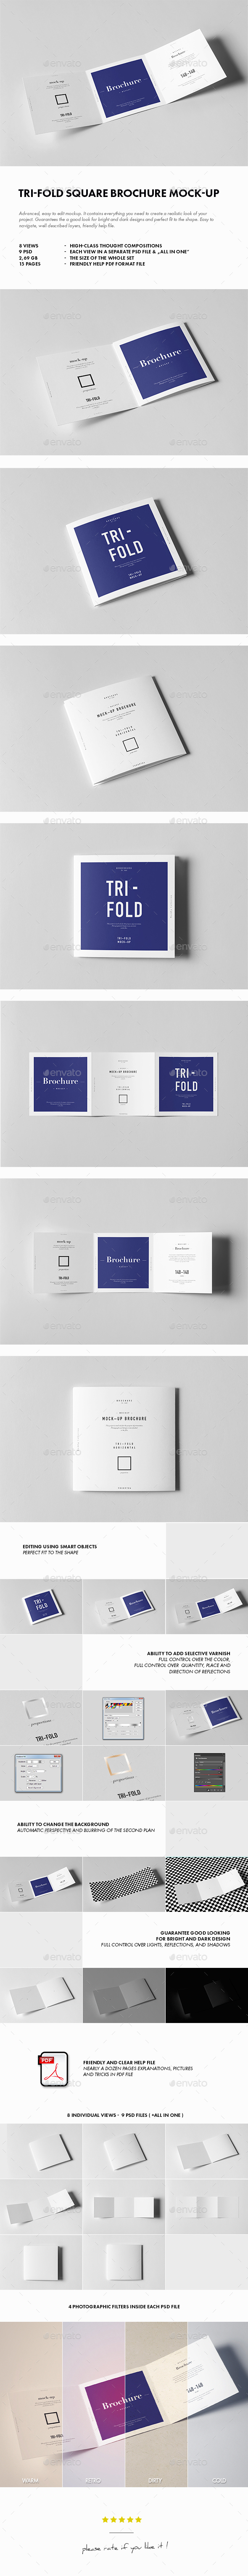 Tri-Fold Square Brochure Mock-up - Brochures Print